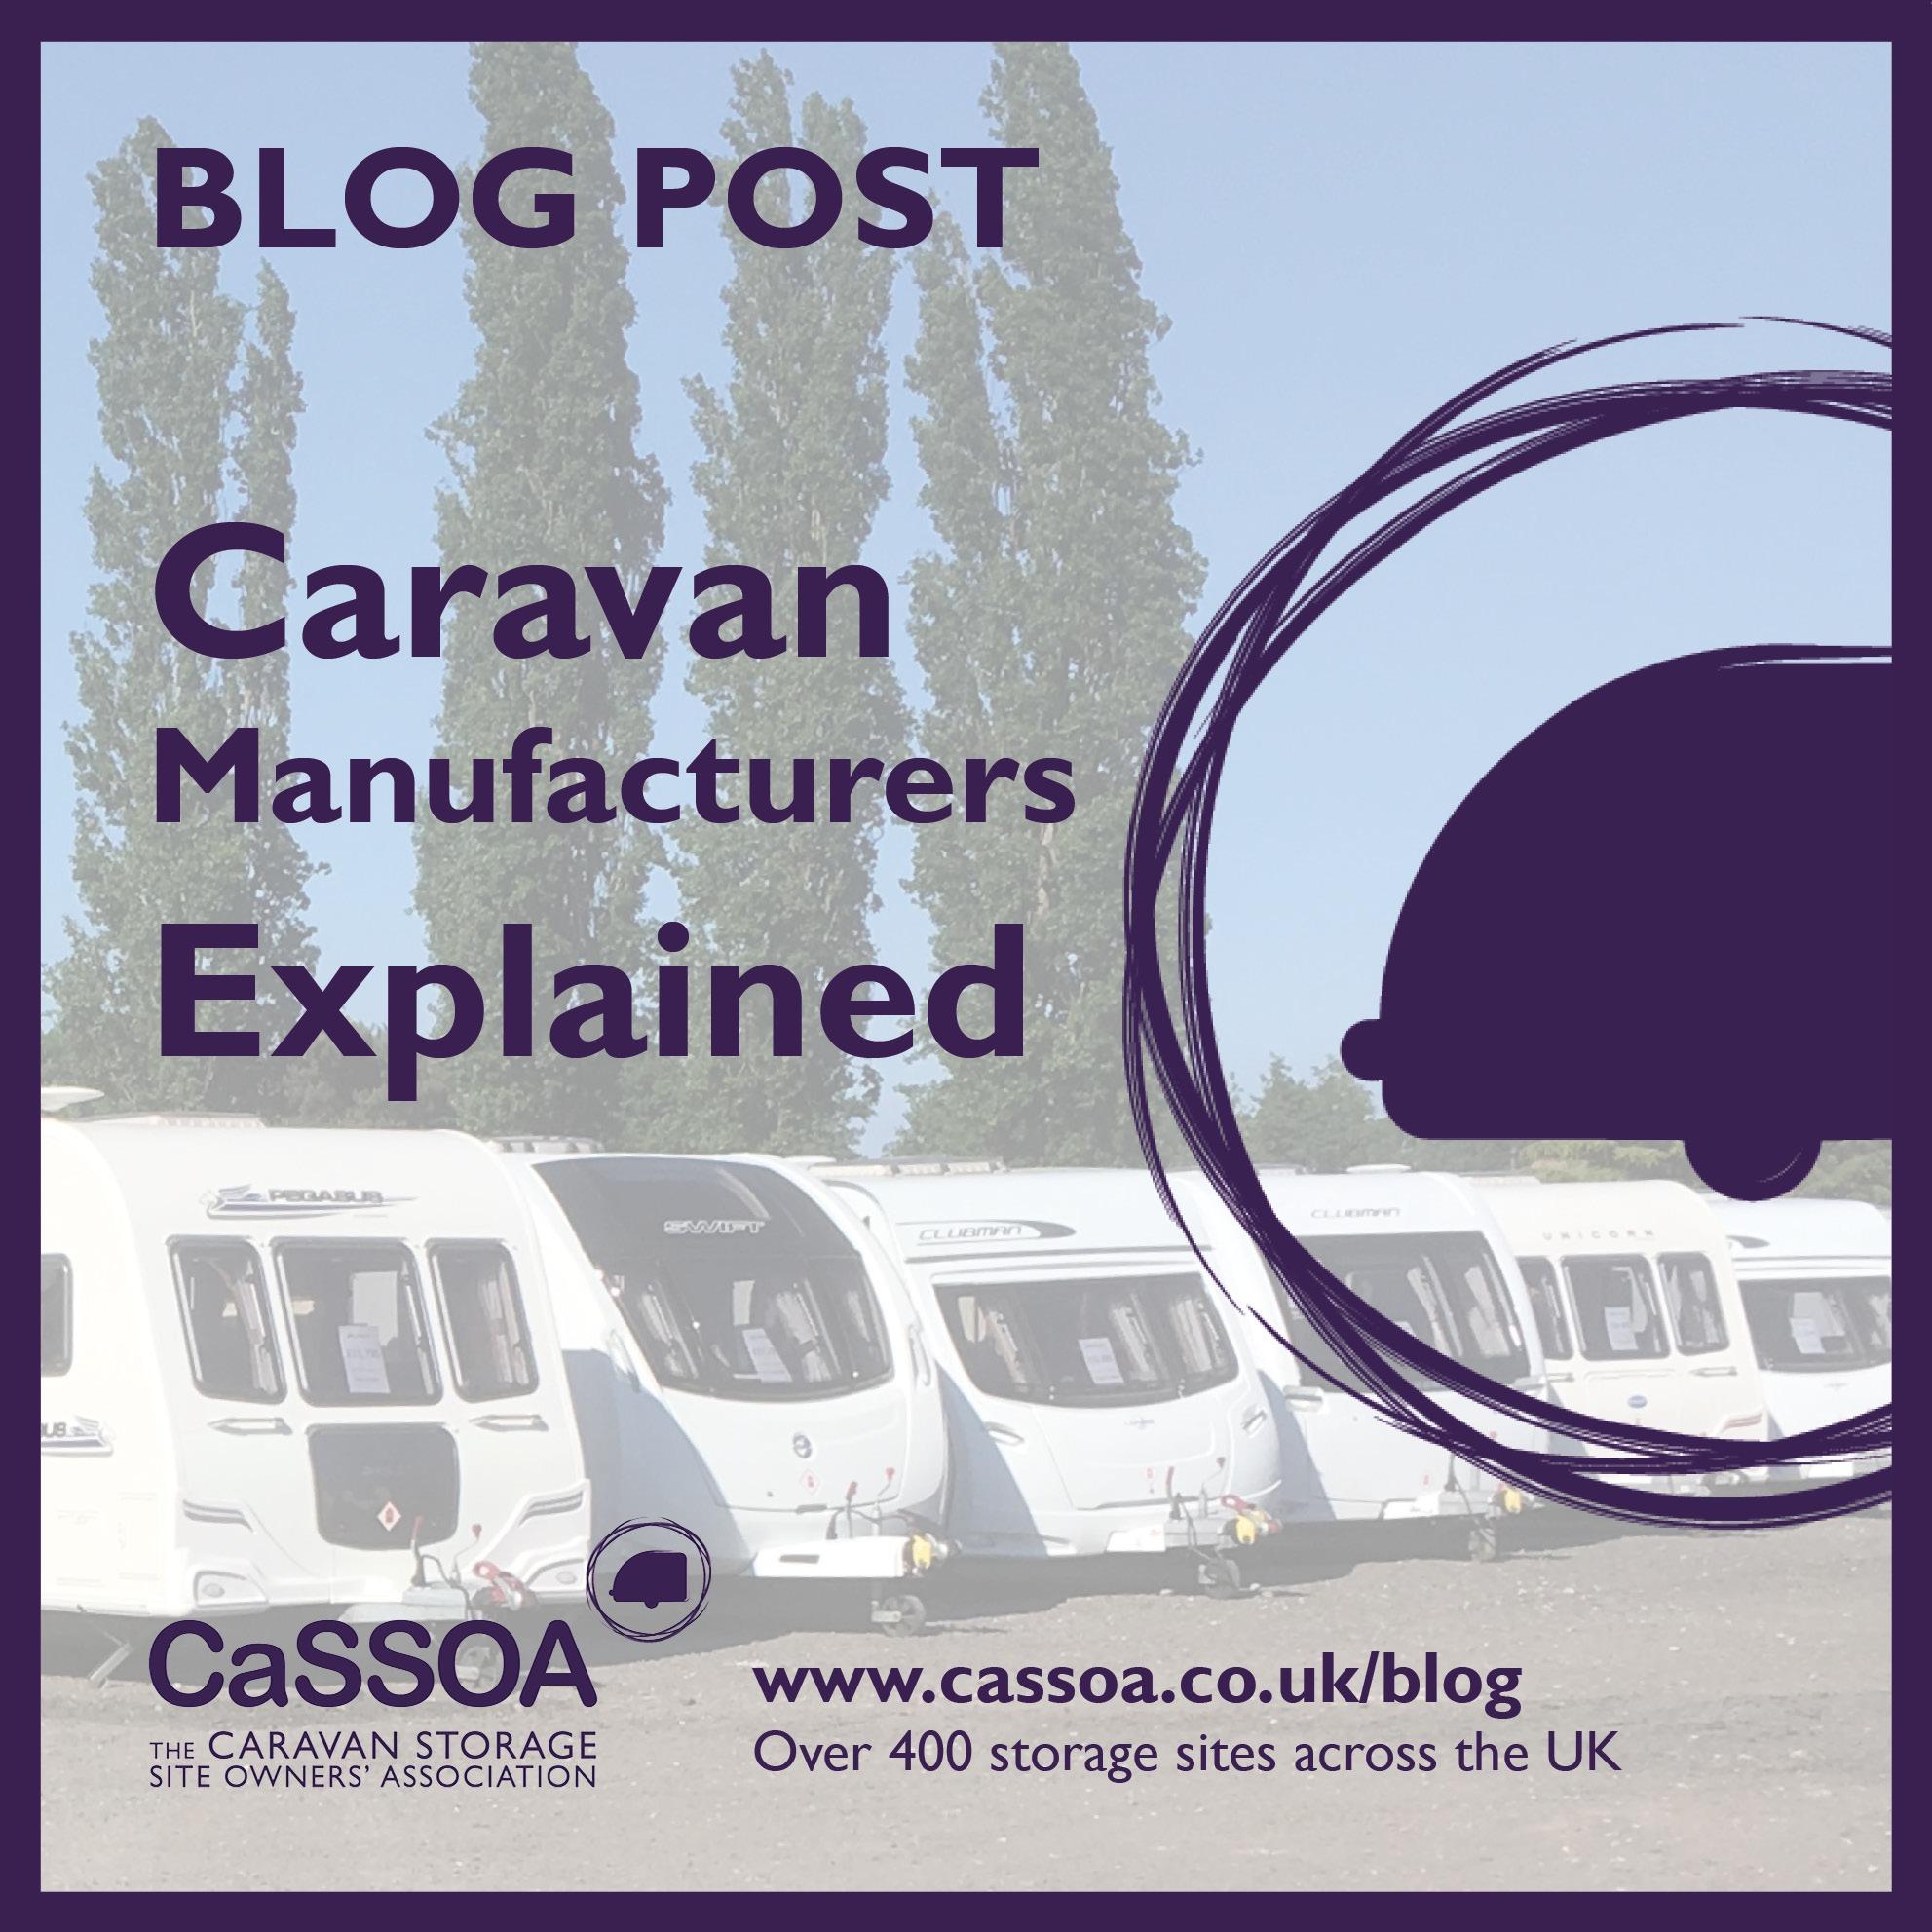 Caravan Manufacturers